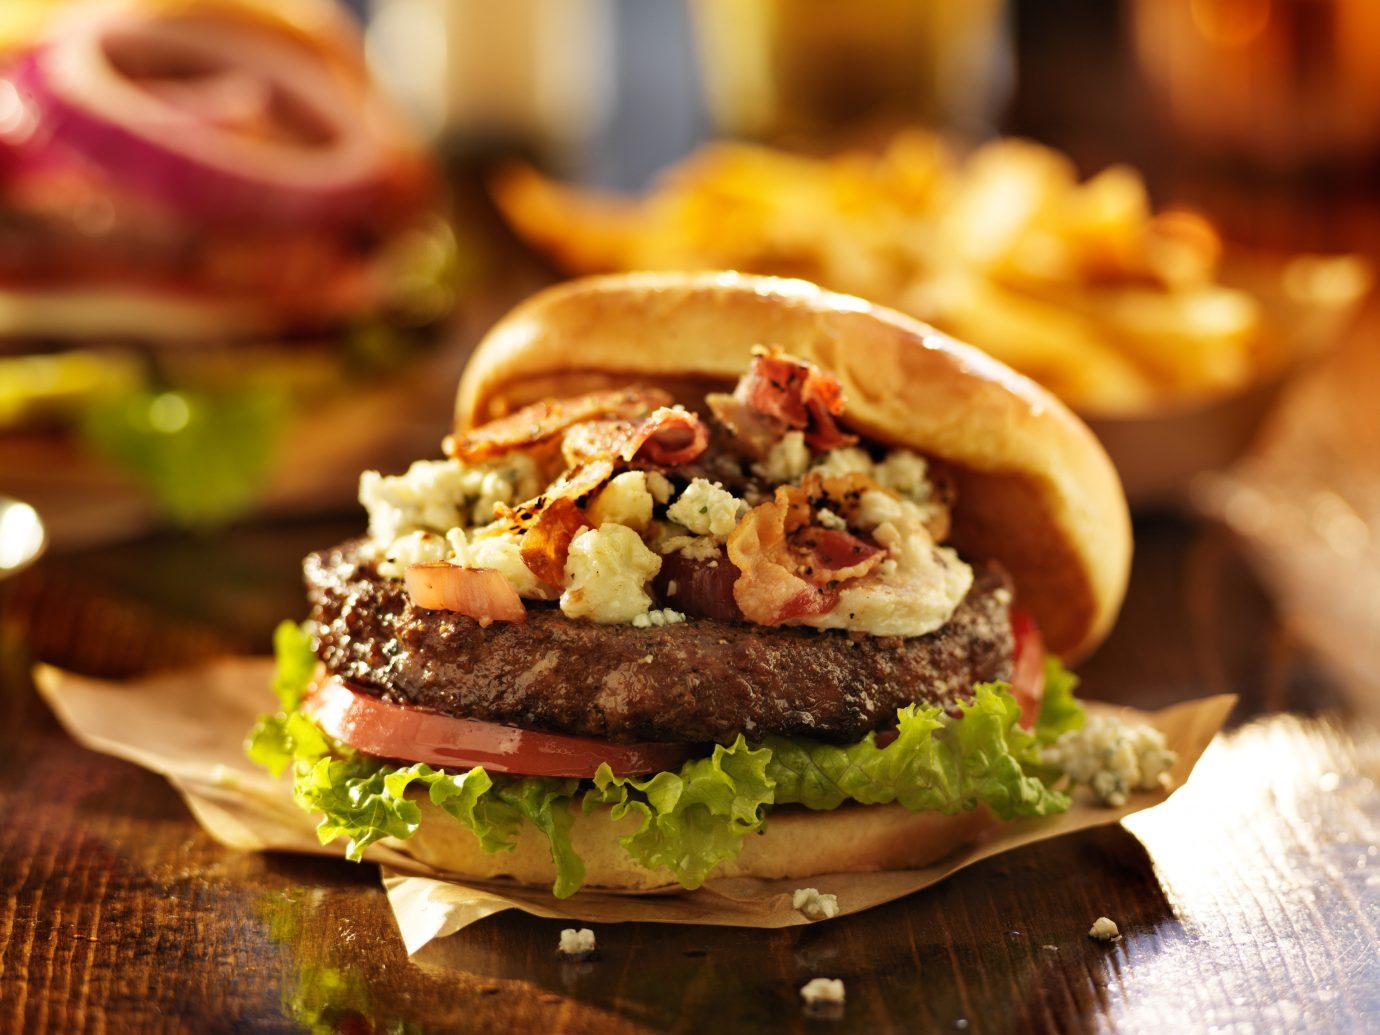 Food + Drink food indoor dish hamburger veggie burger meat sandwich snack food slider produce meal cheeseburger sloppy joe cuisine fast food restaurant